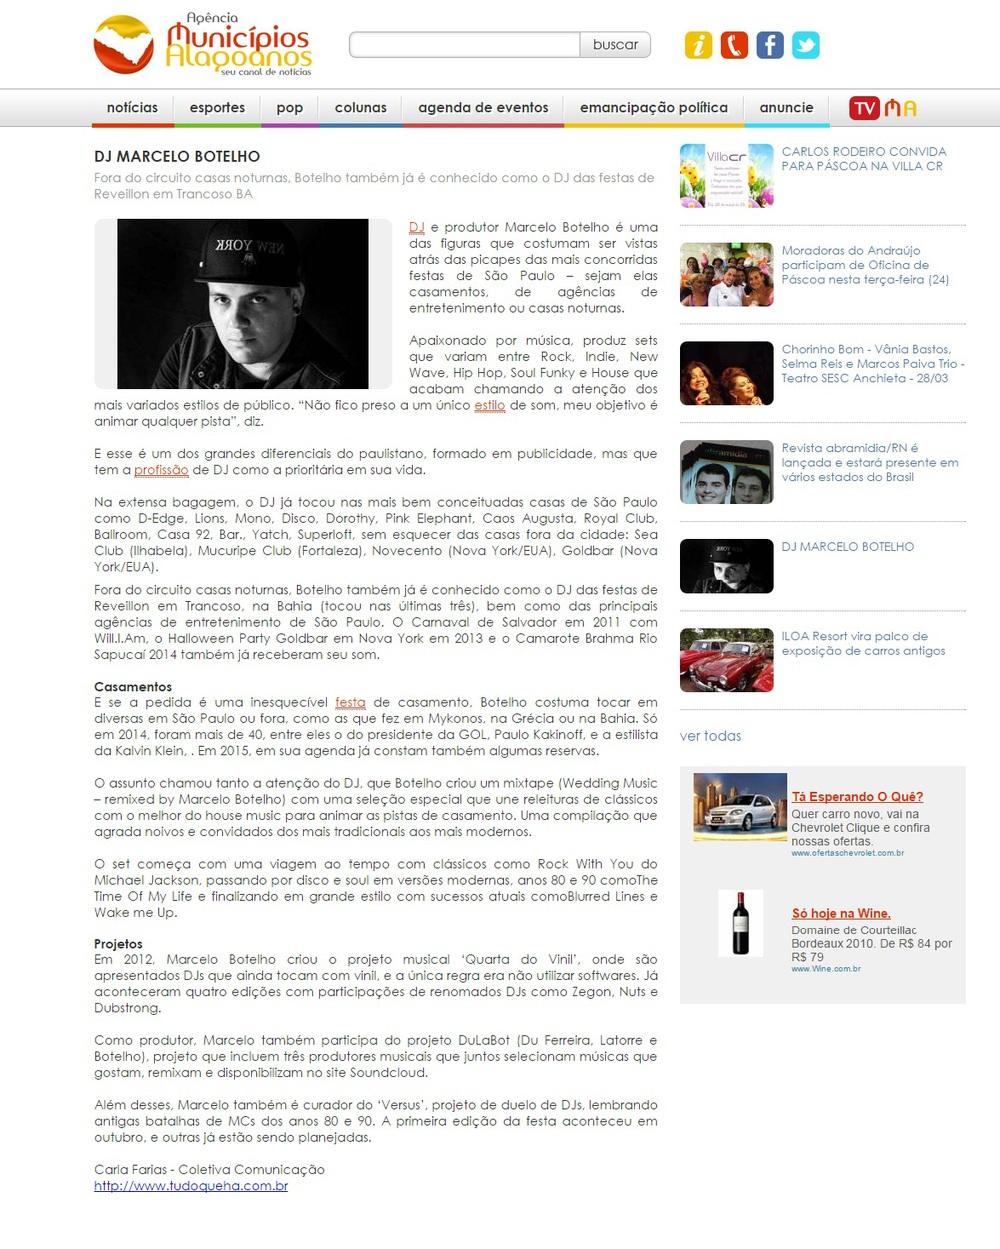 MUNICIPIOS ALAGOANOS - MARCELO BOTELHO - 27.03.jpg